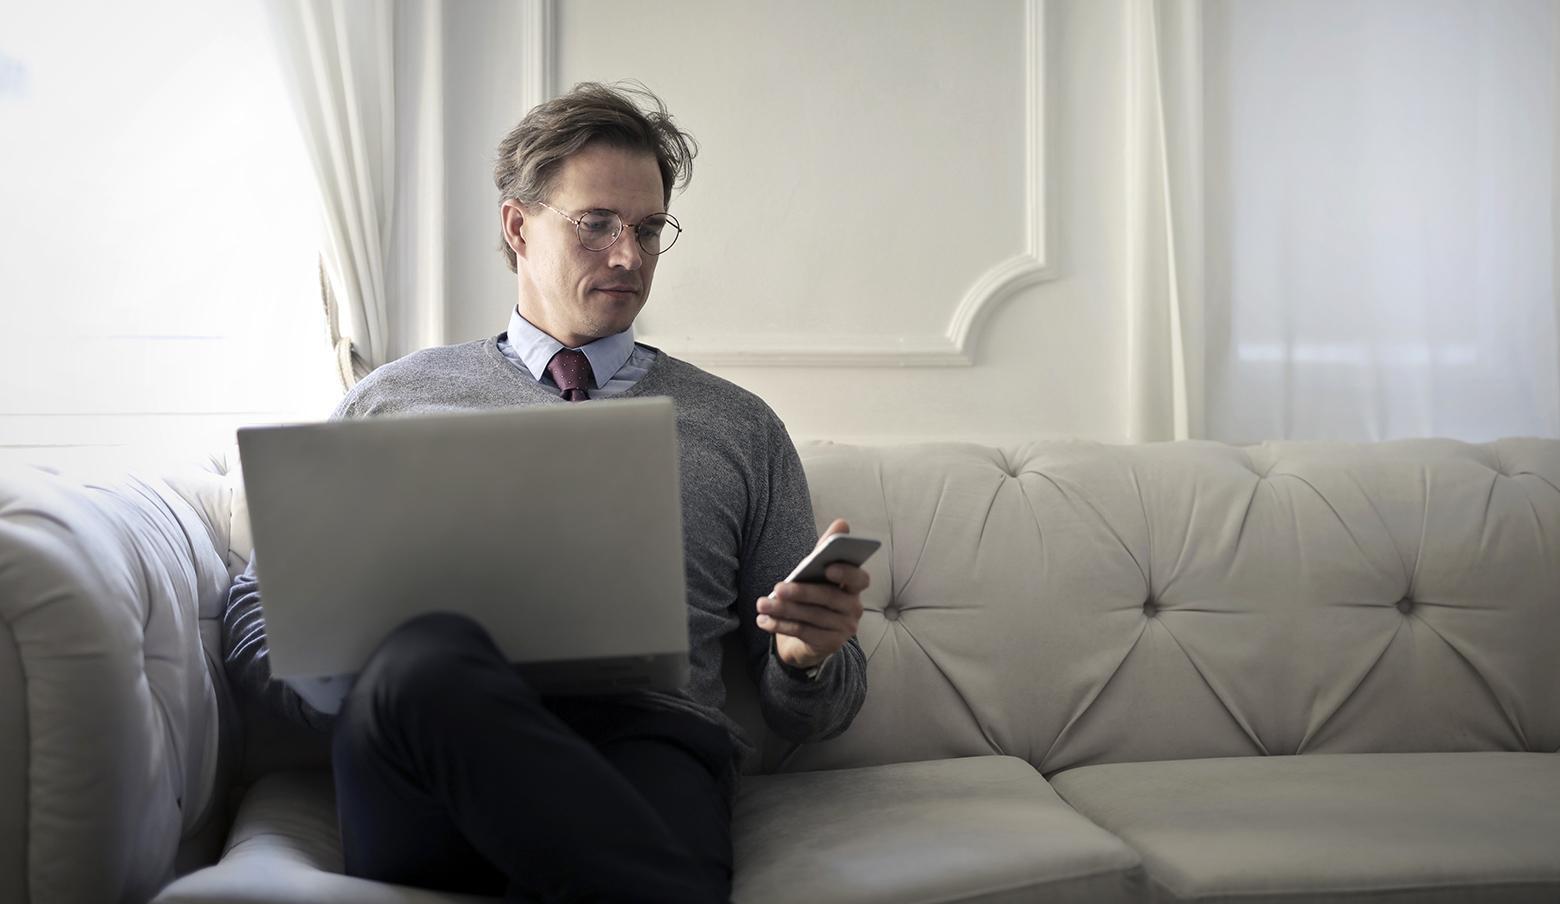 Designer tips for working remotely